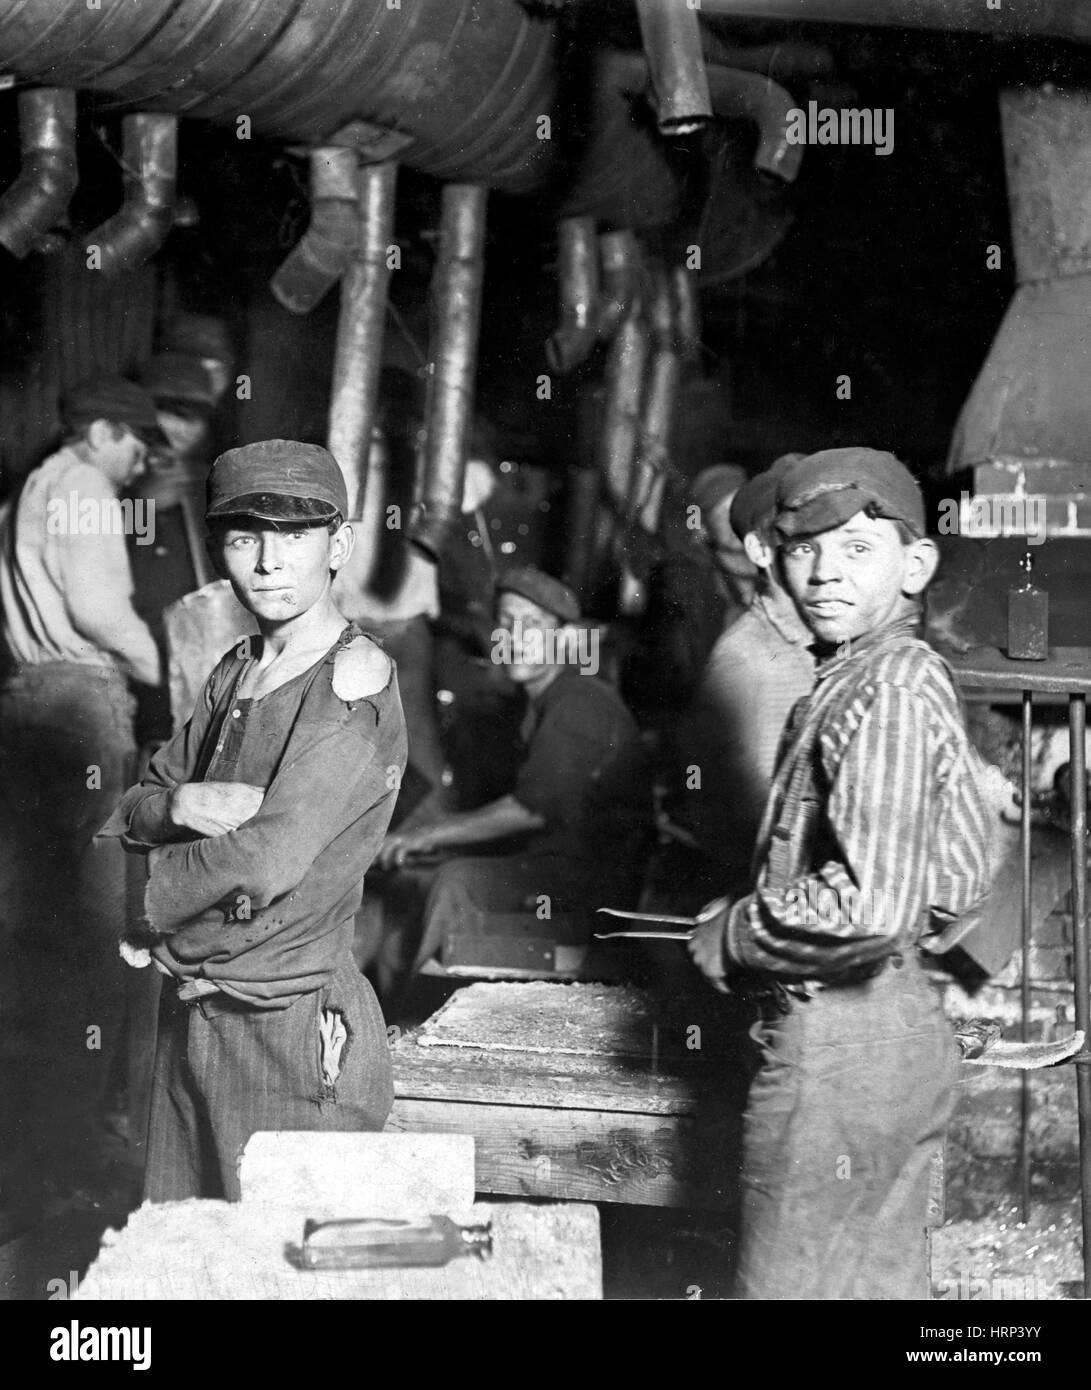 Indiana Glass Works Boys, 1908 - Stock Image